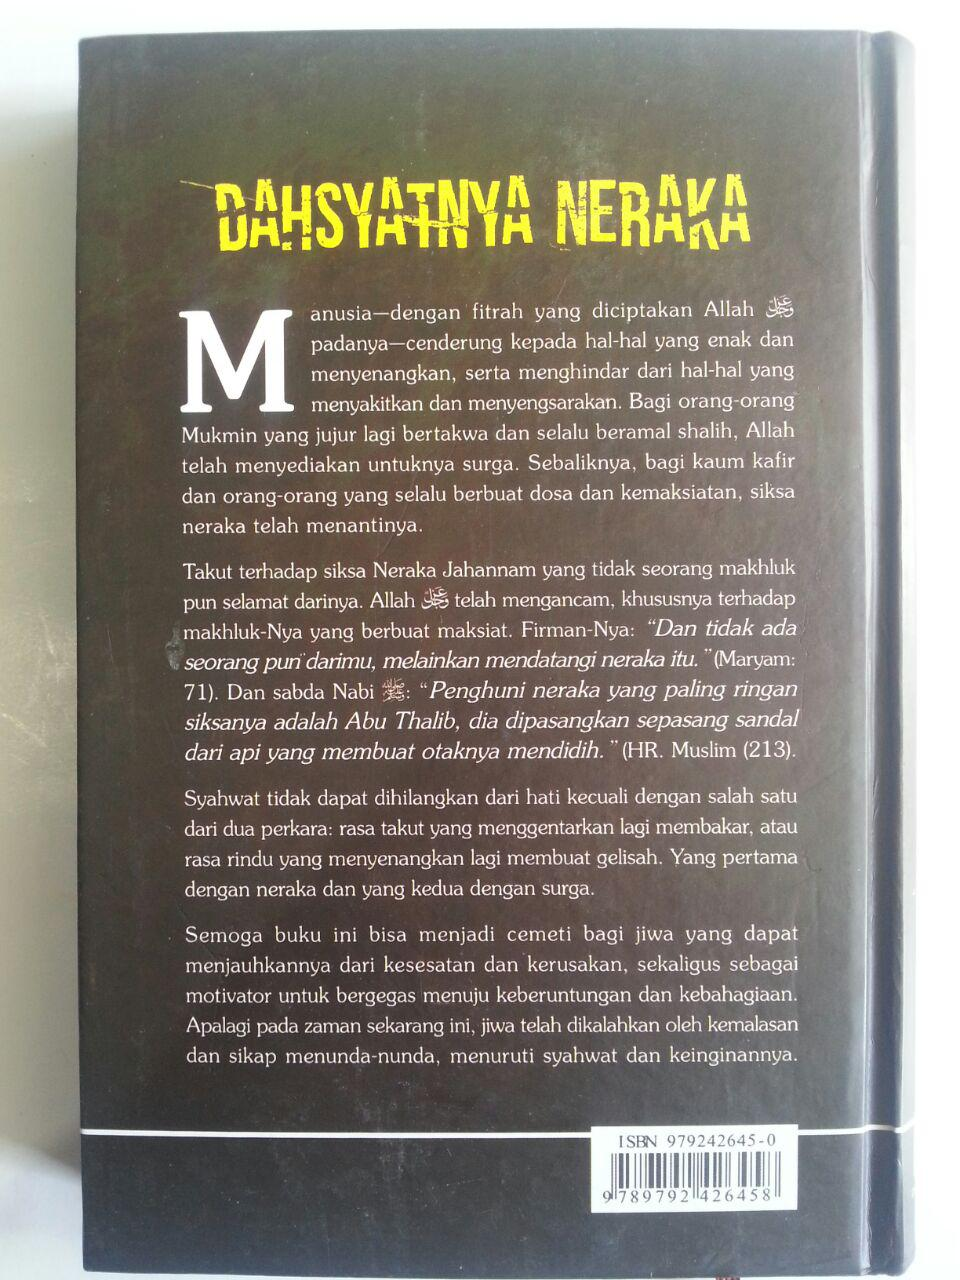 Buku Dahsyatnya Neraka isi cover